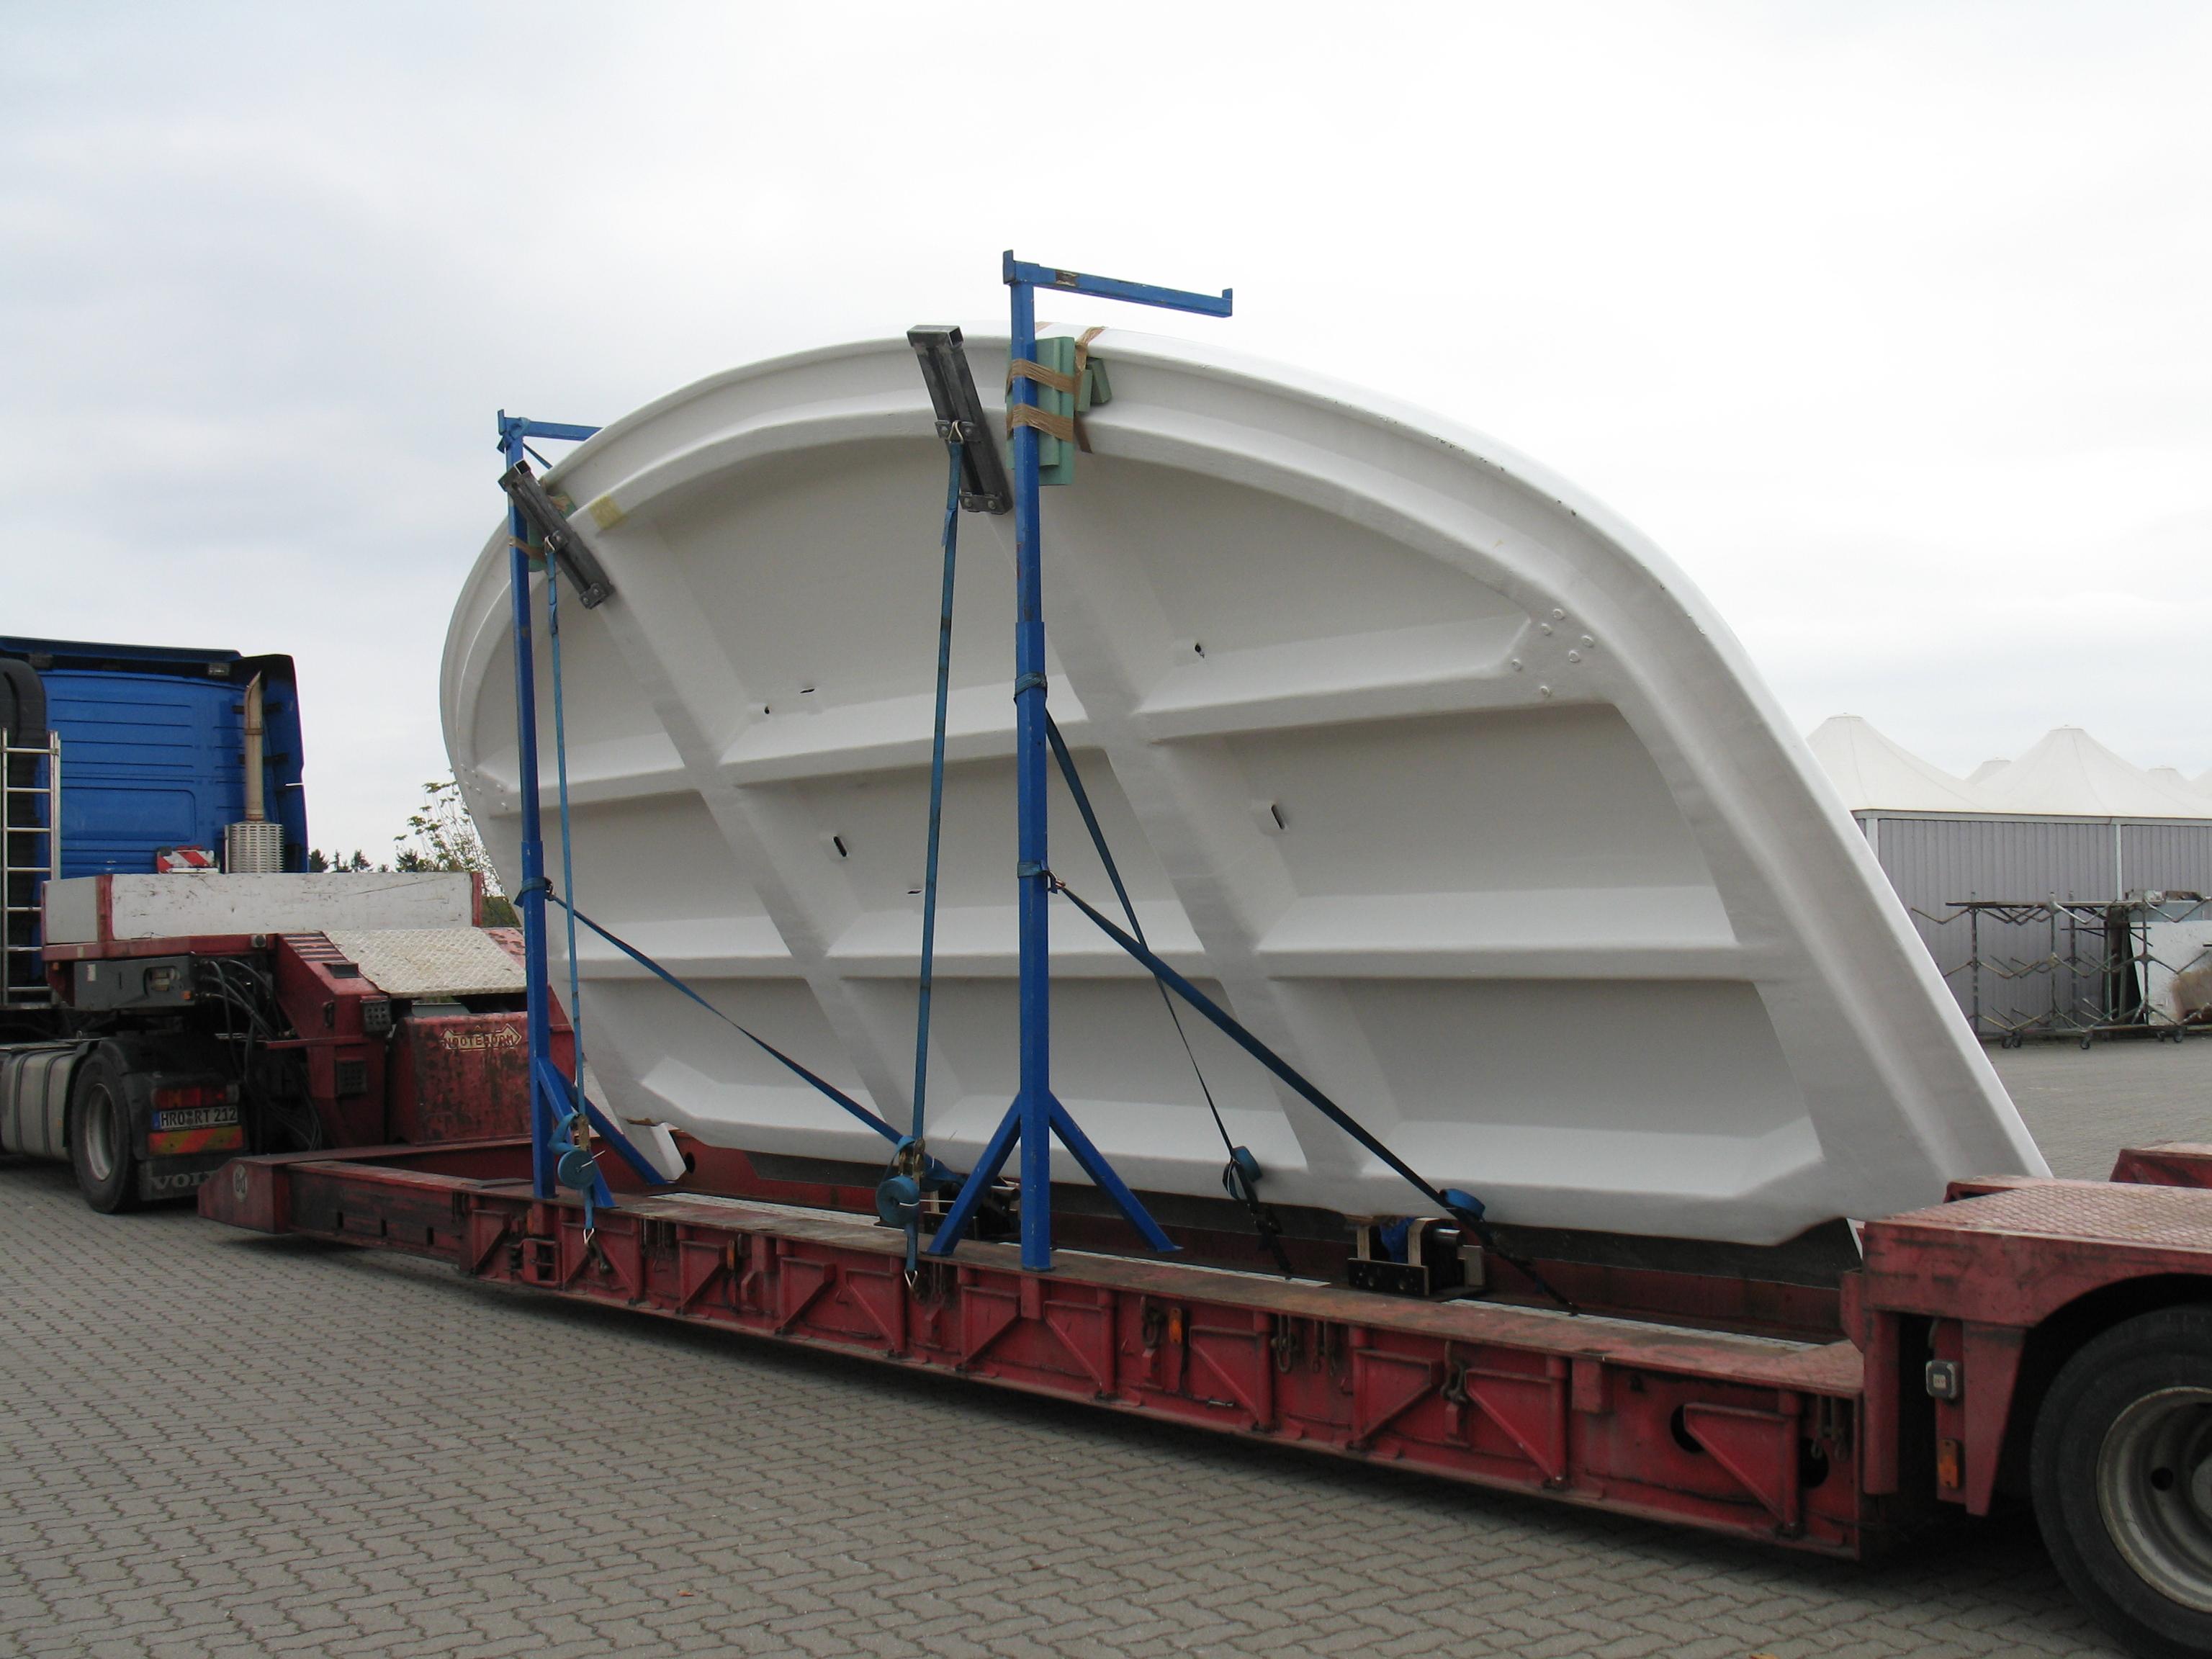 Yacht 777